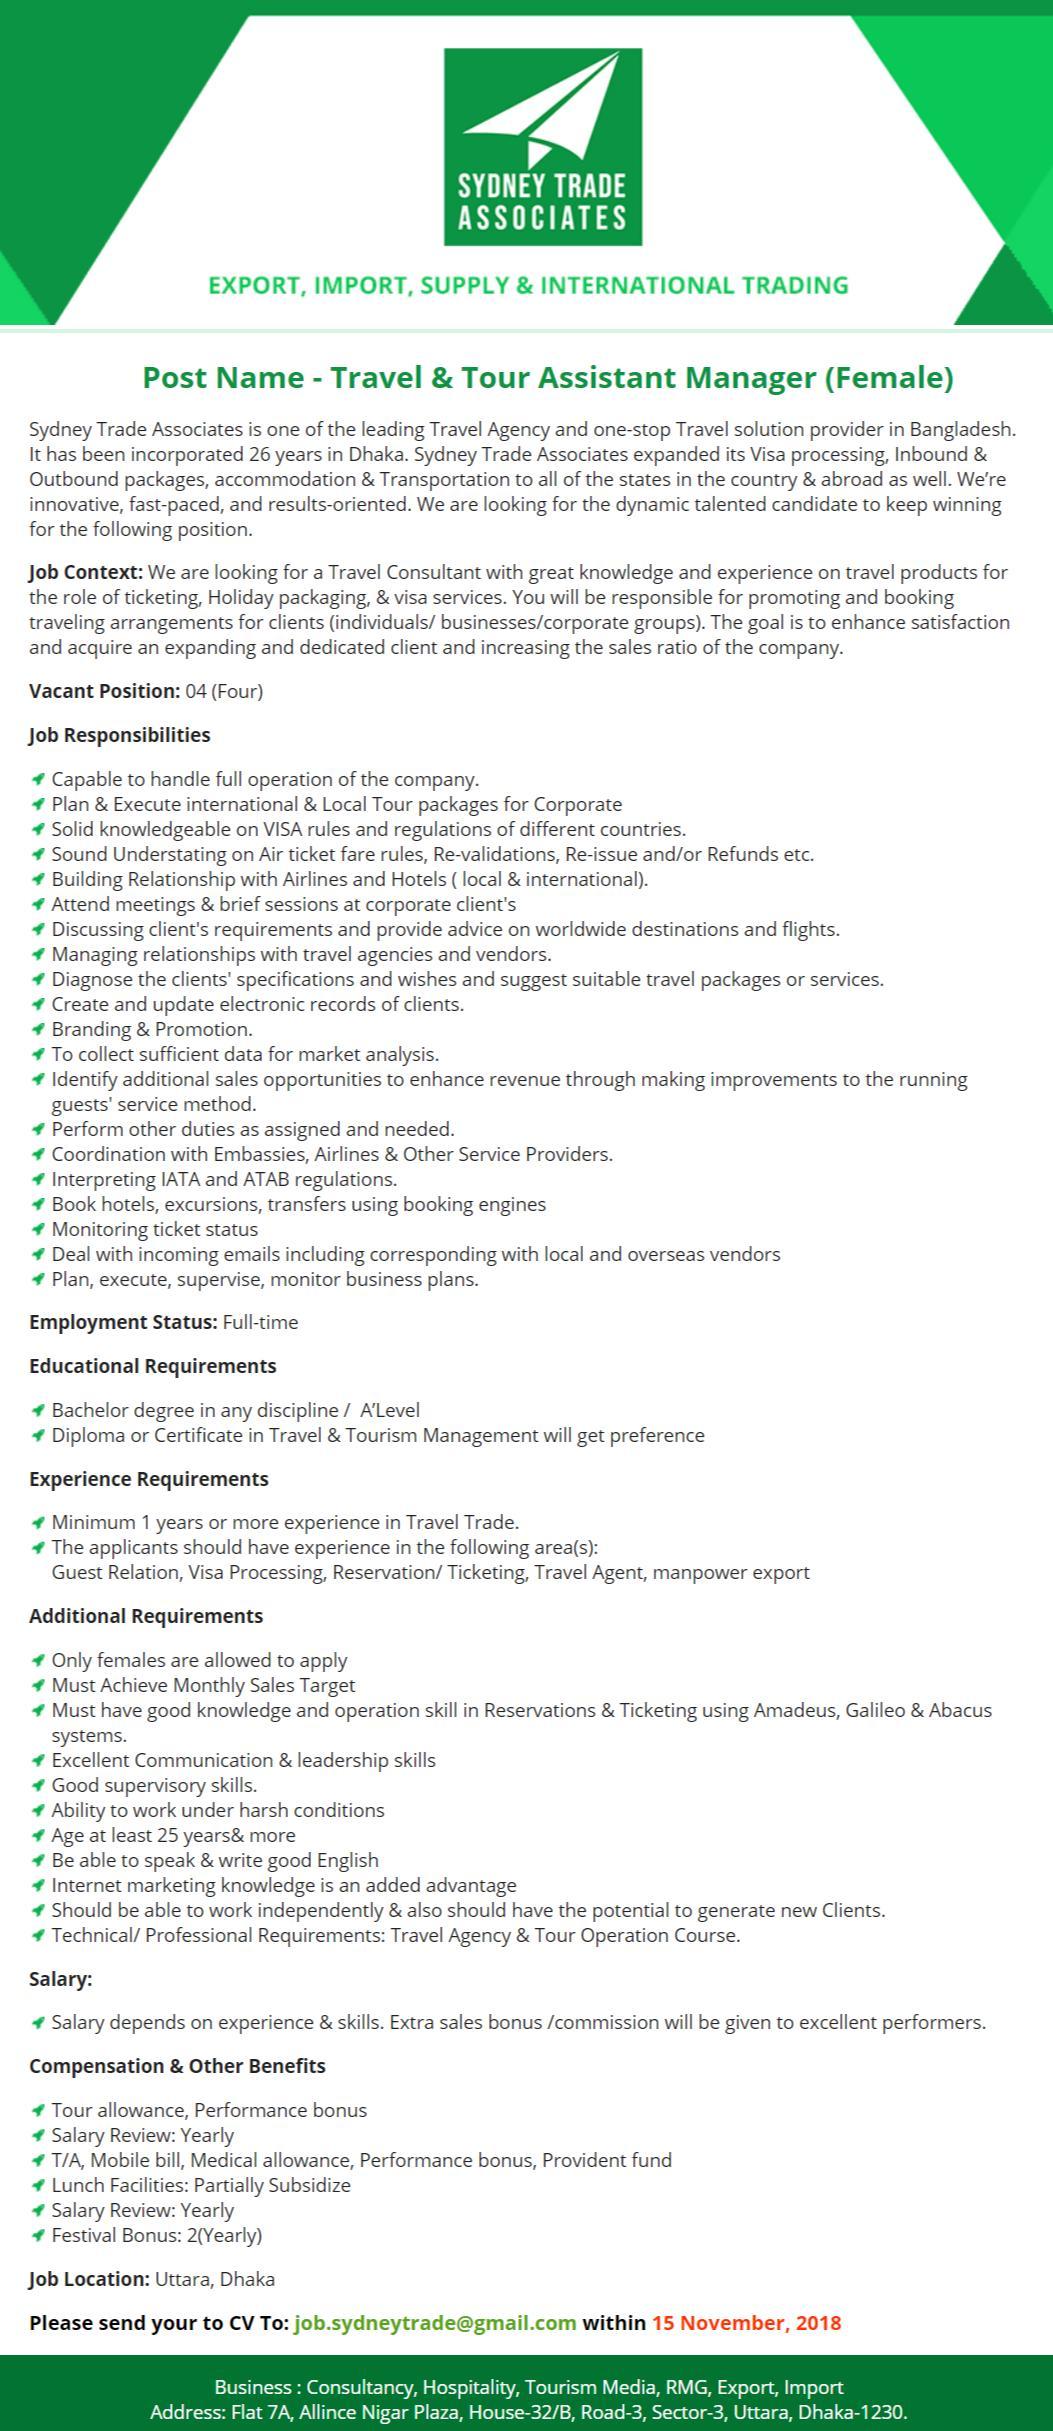 Sydney Trade Associates Job Circular